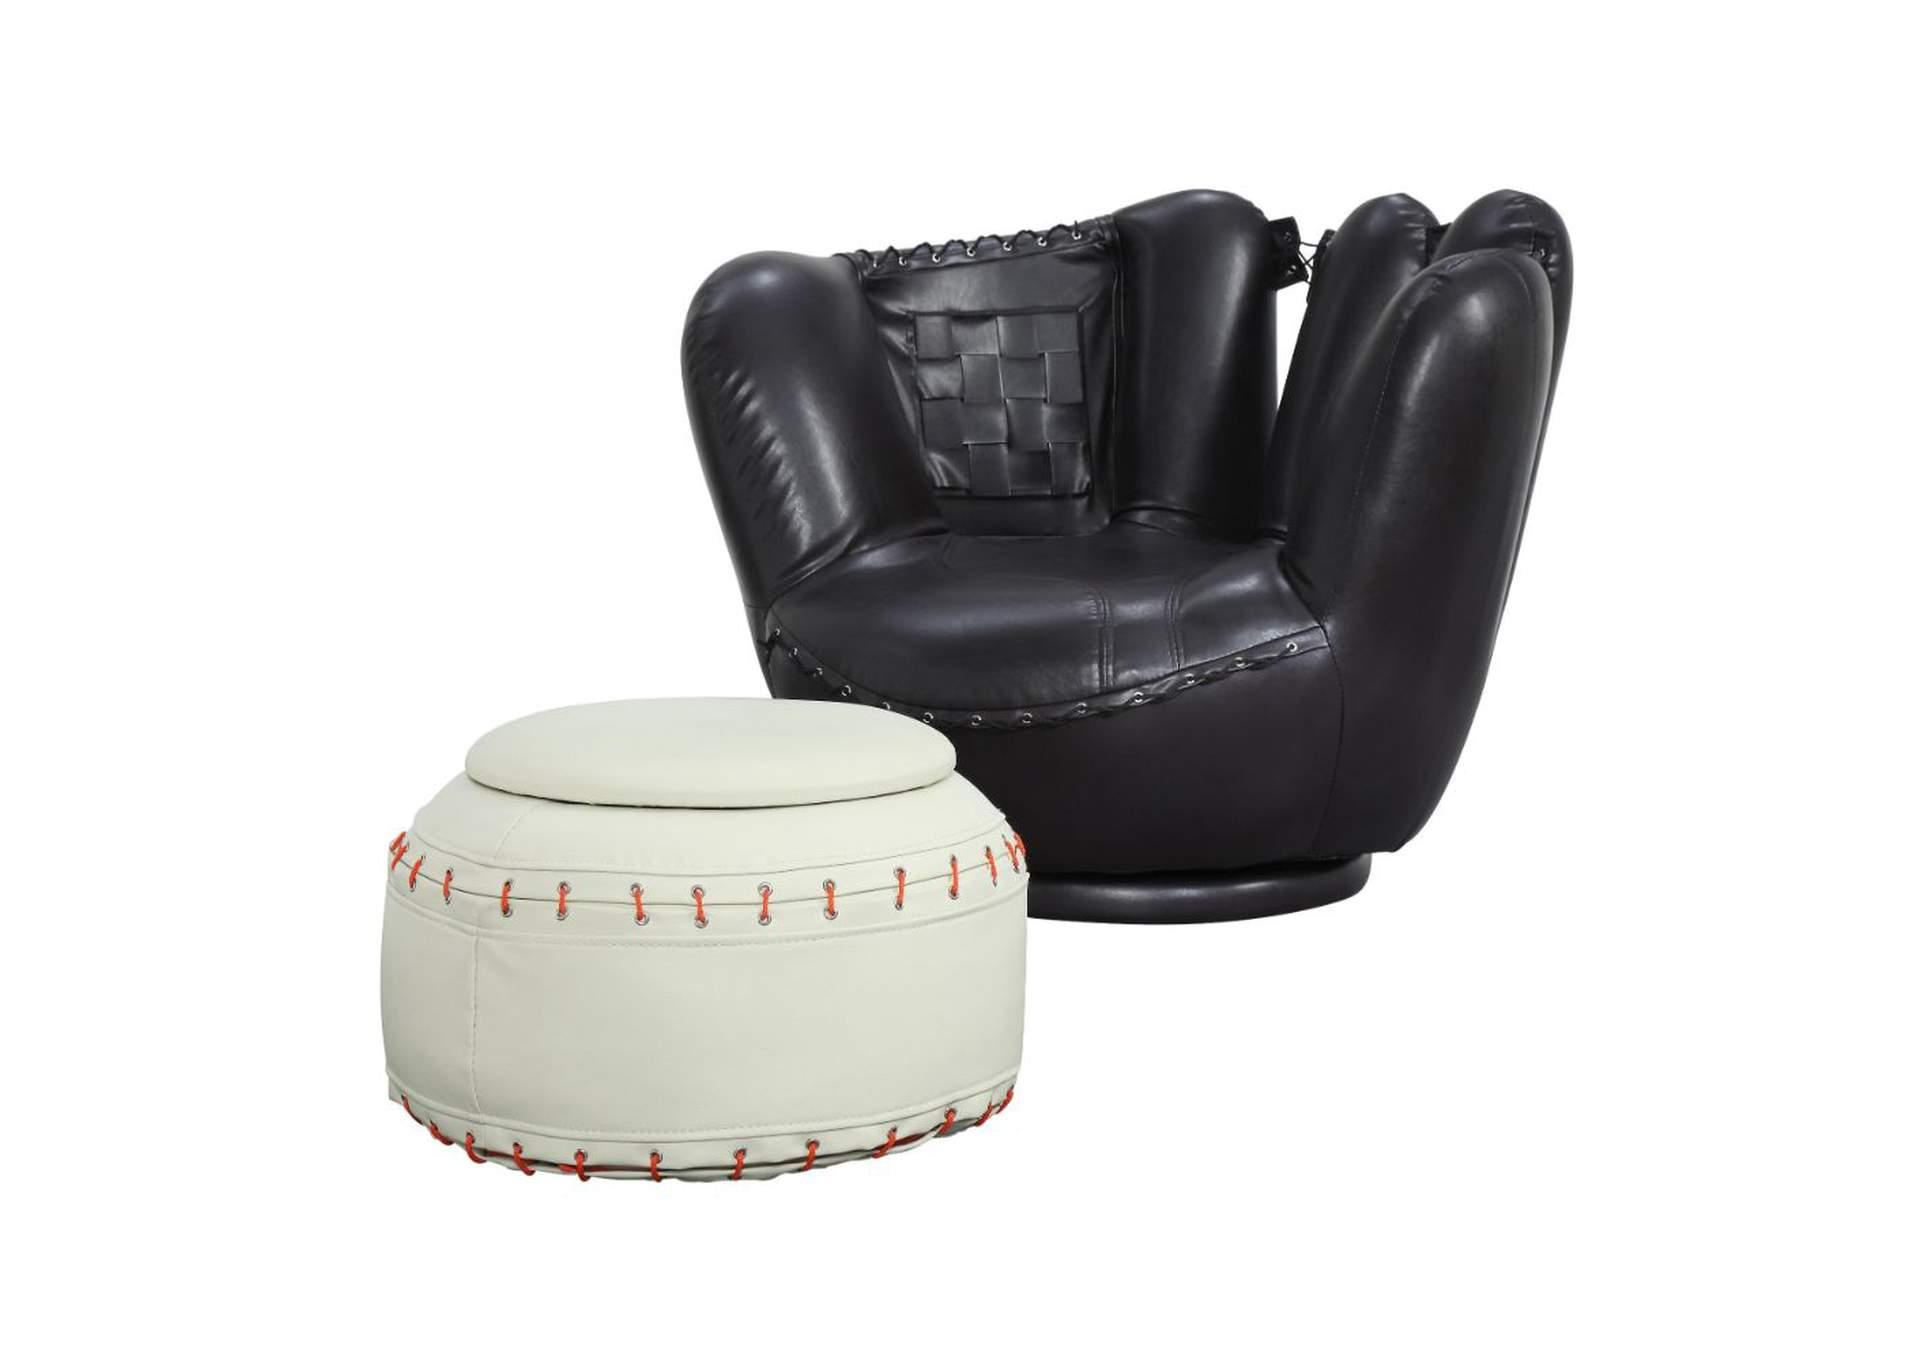 Just Furniture All Star Baseball Black Glove Chair White Ottoman